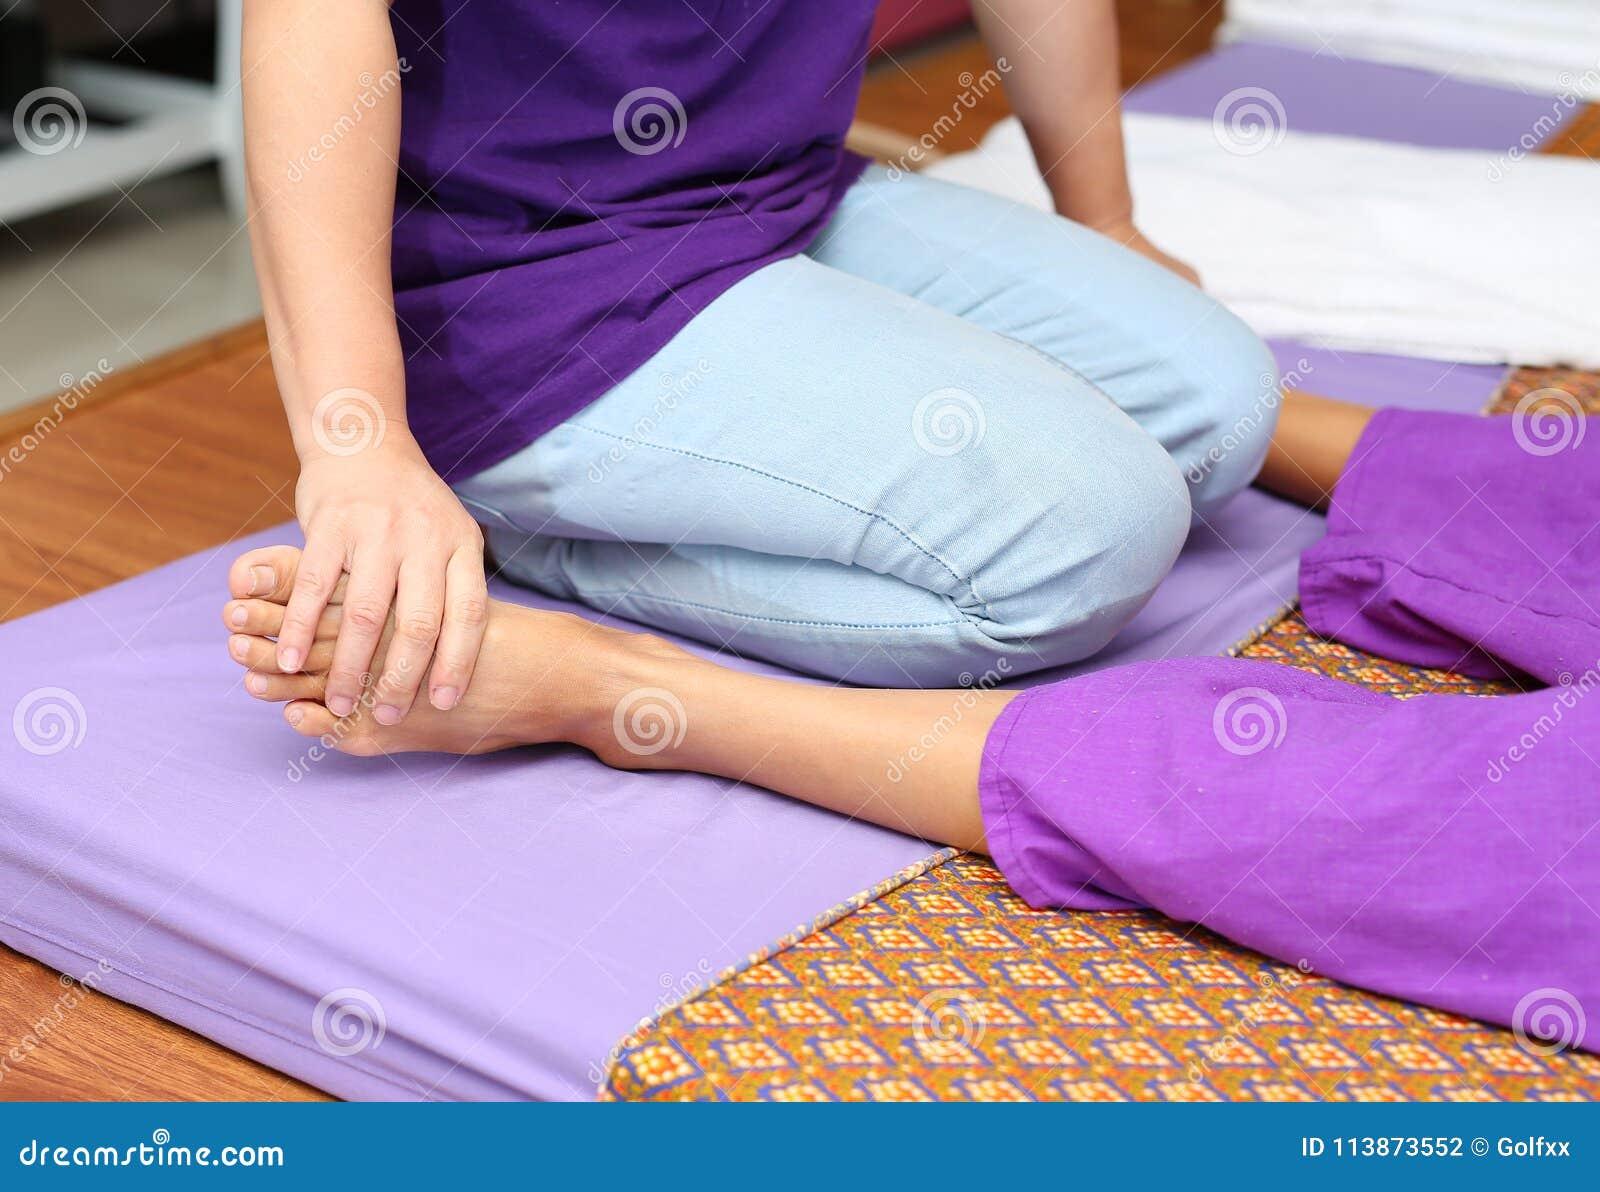 Famous Thai massage, Therapist action for customer.